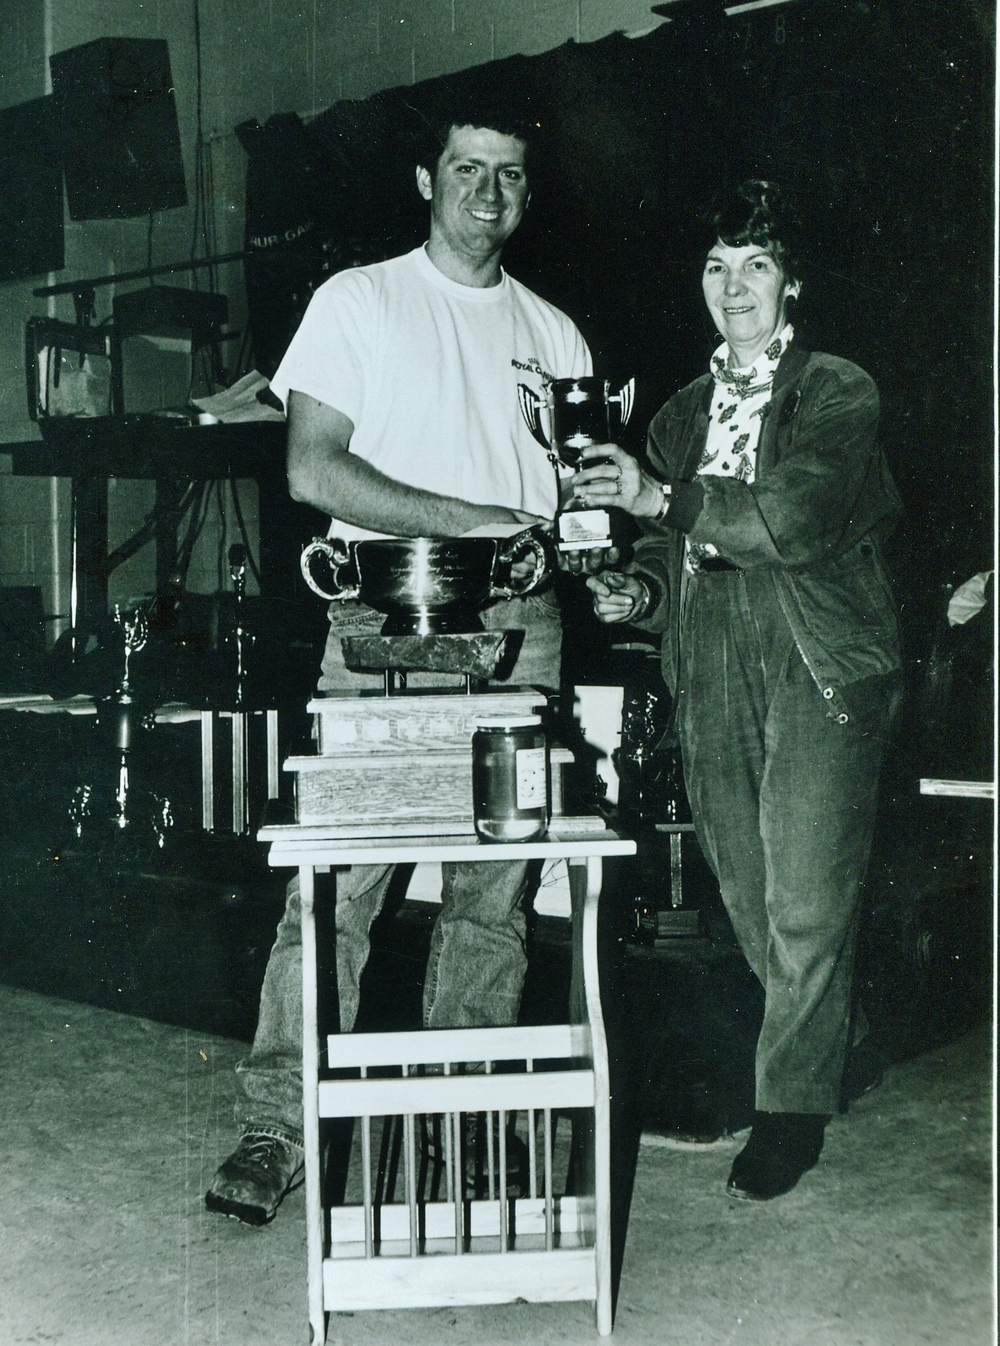 Snofest 1994 Tim McEwen, Marmora Cup Winner (150 miles) - Copy (3)